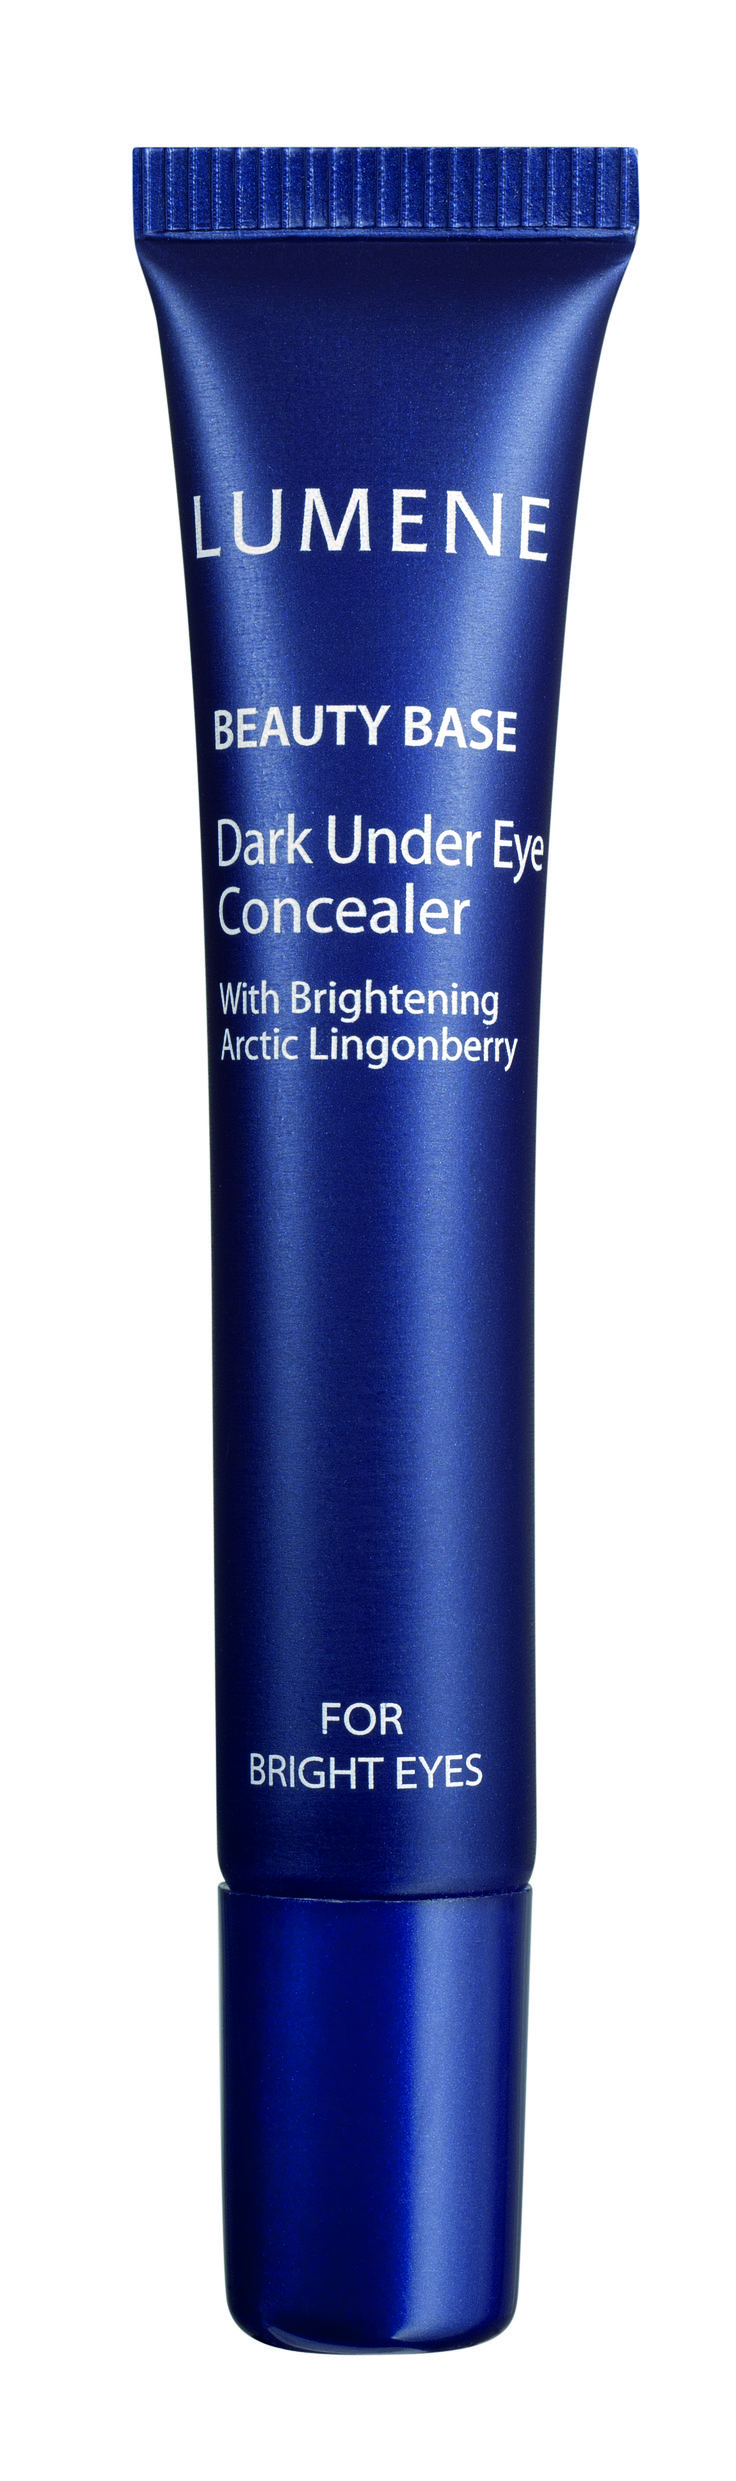 Lumene Beauty Base Dark Under Eye Concealer